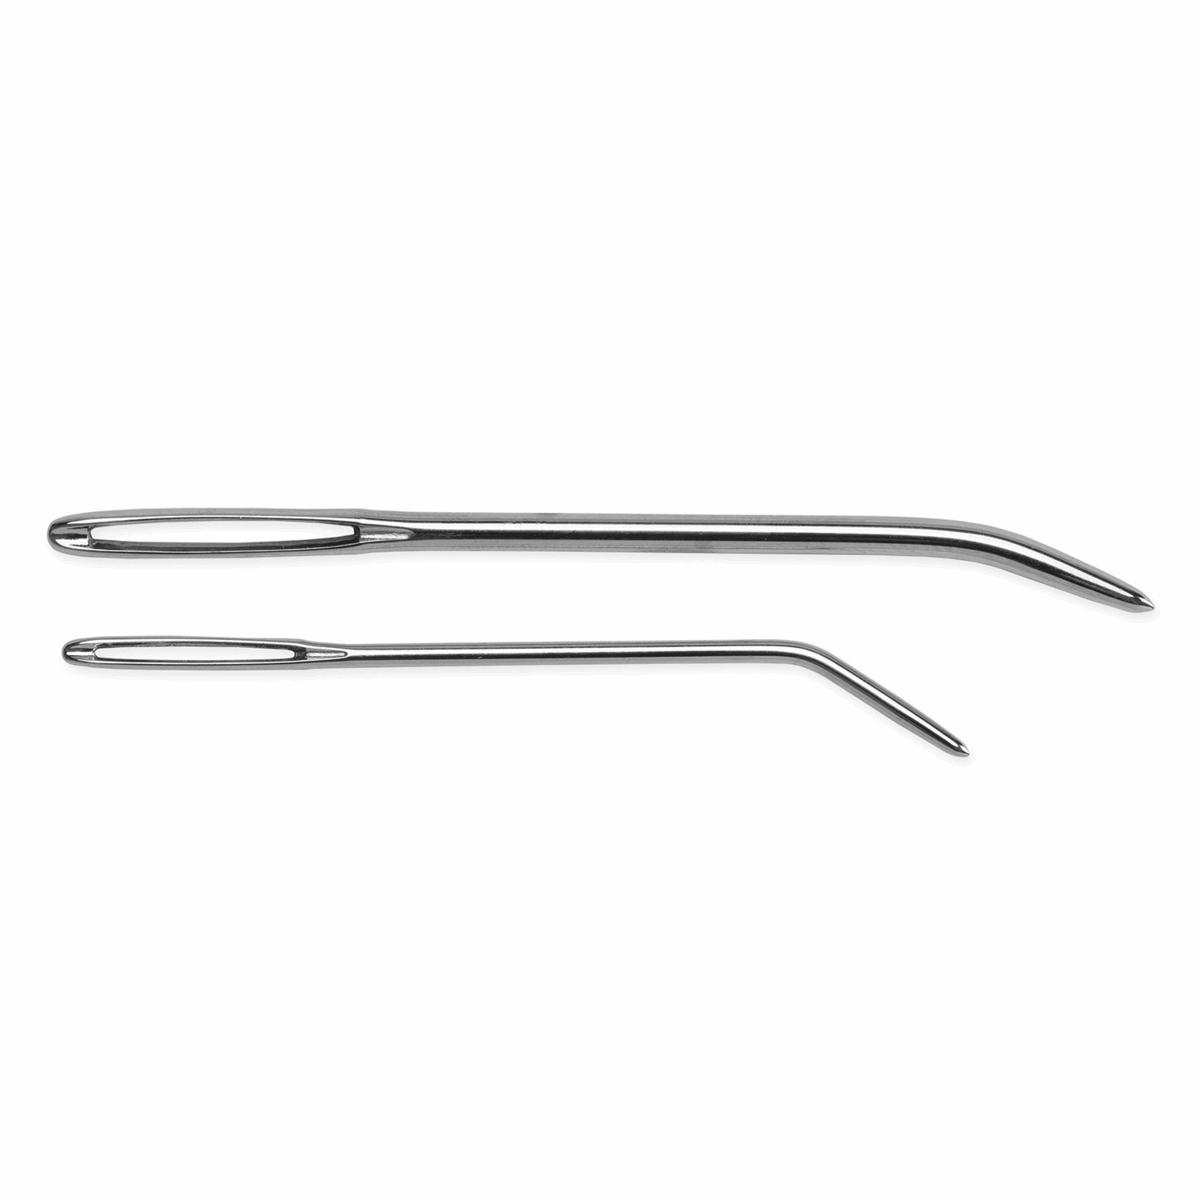 Smyra/Wool curved Needles